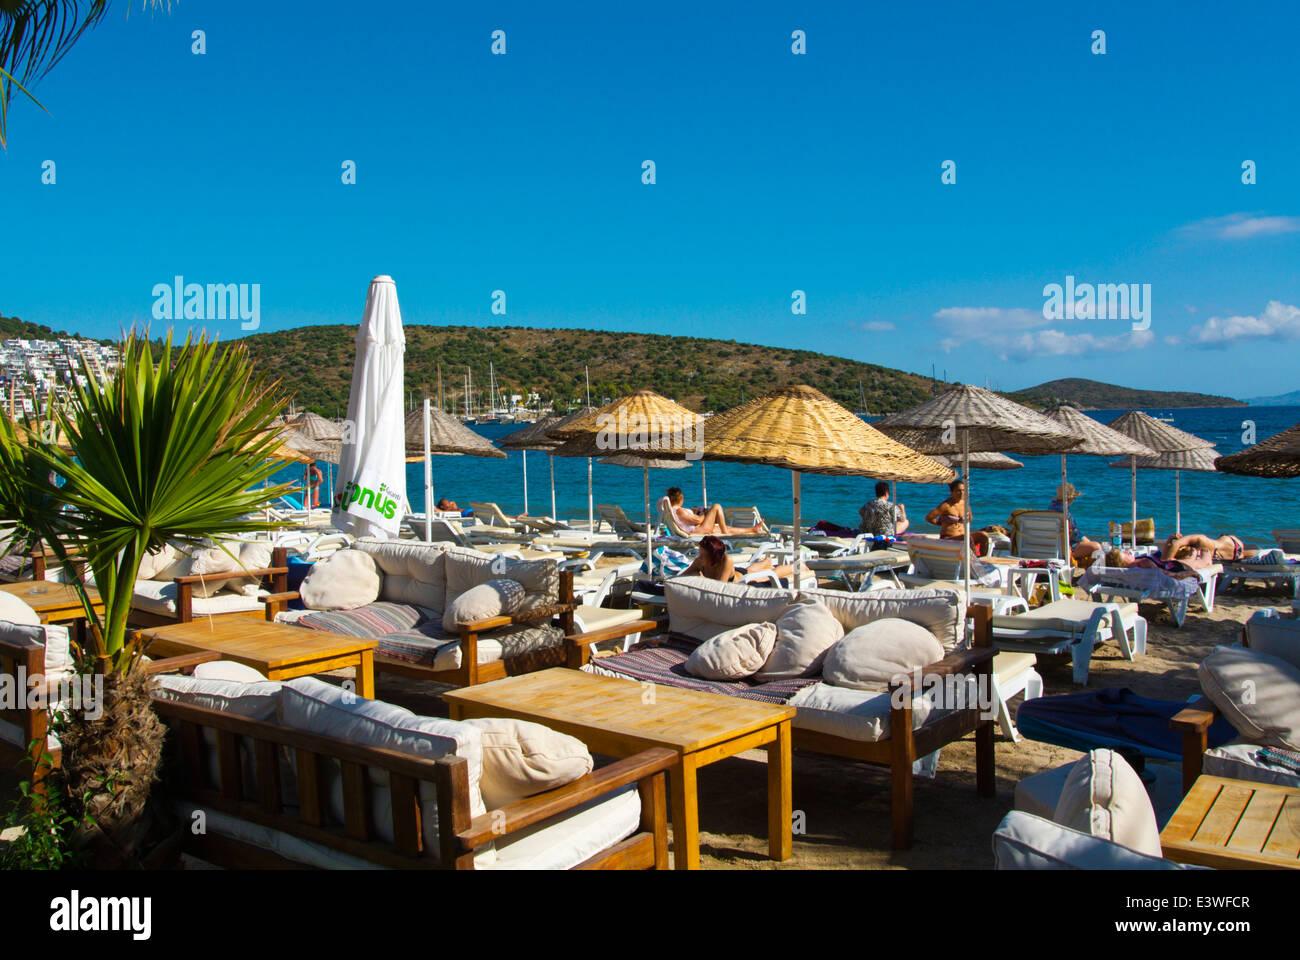 Terrace on the beach, Bitez resort, near Bodrum, Mugla region, western Turkey, Asia Minor - Stock Image